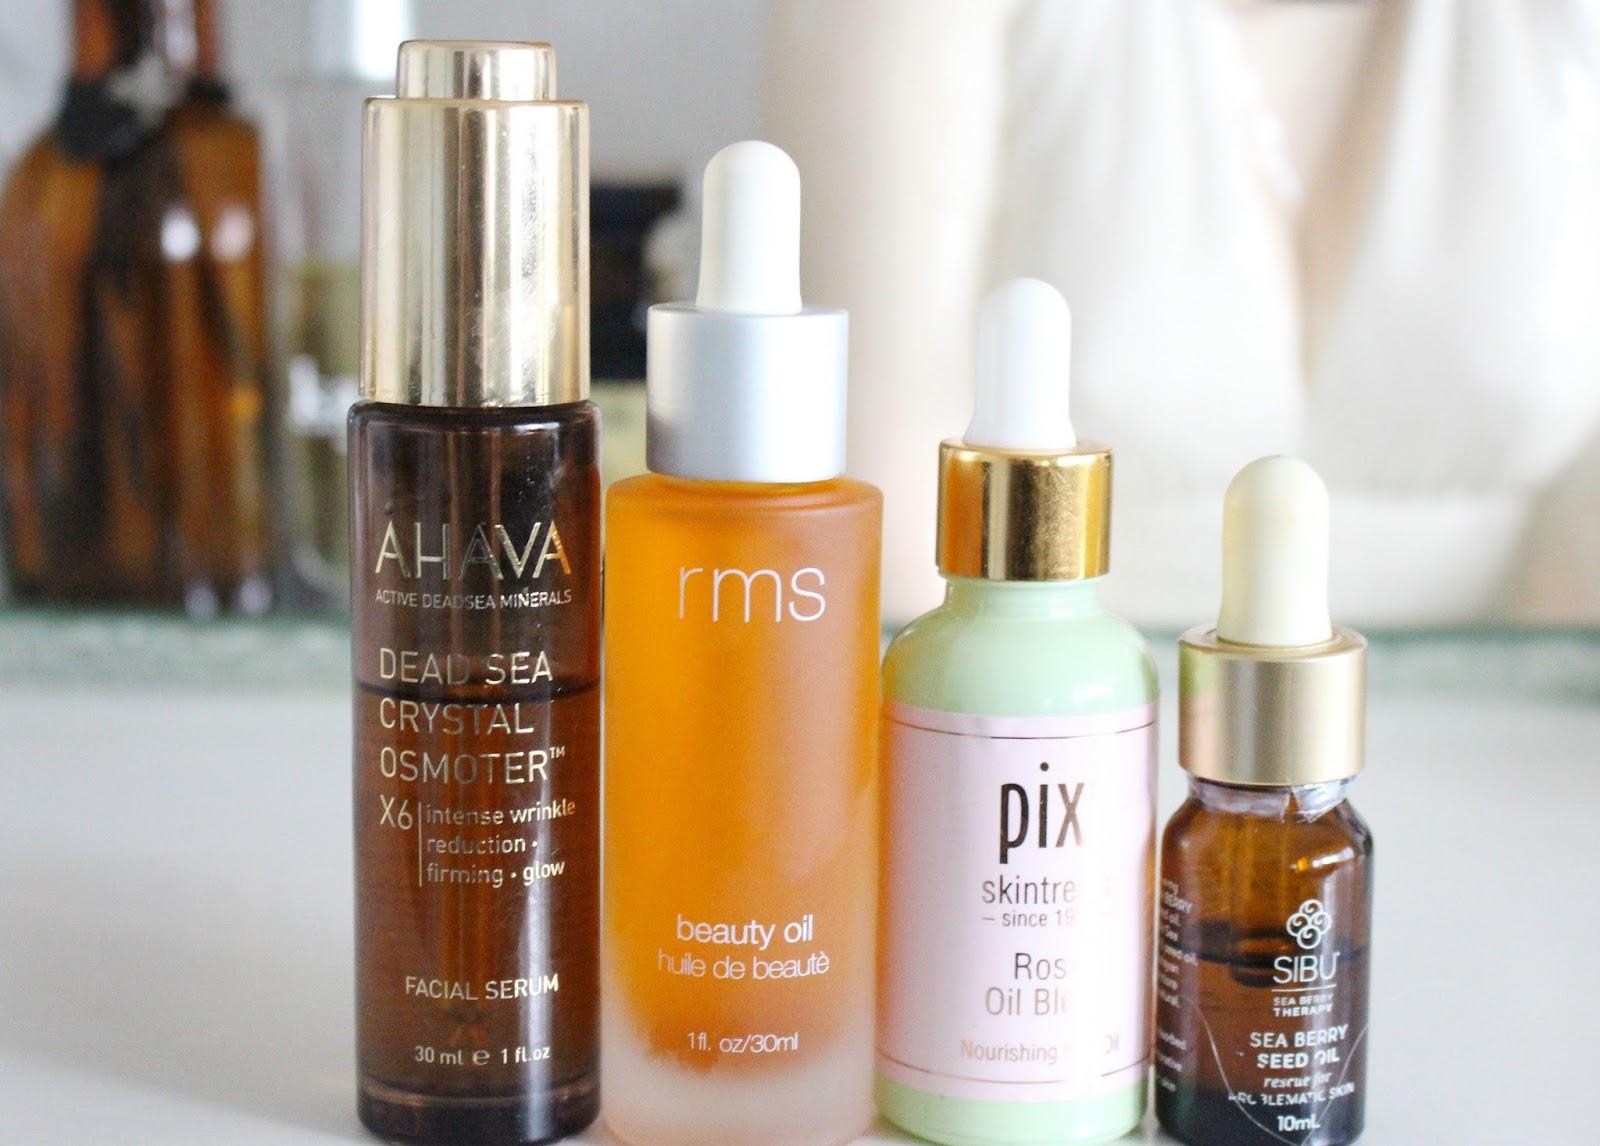 beauty oils for combination skin, facial oils for combination skin